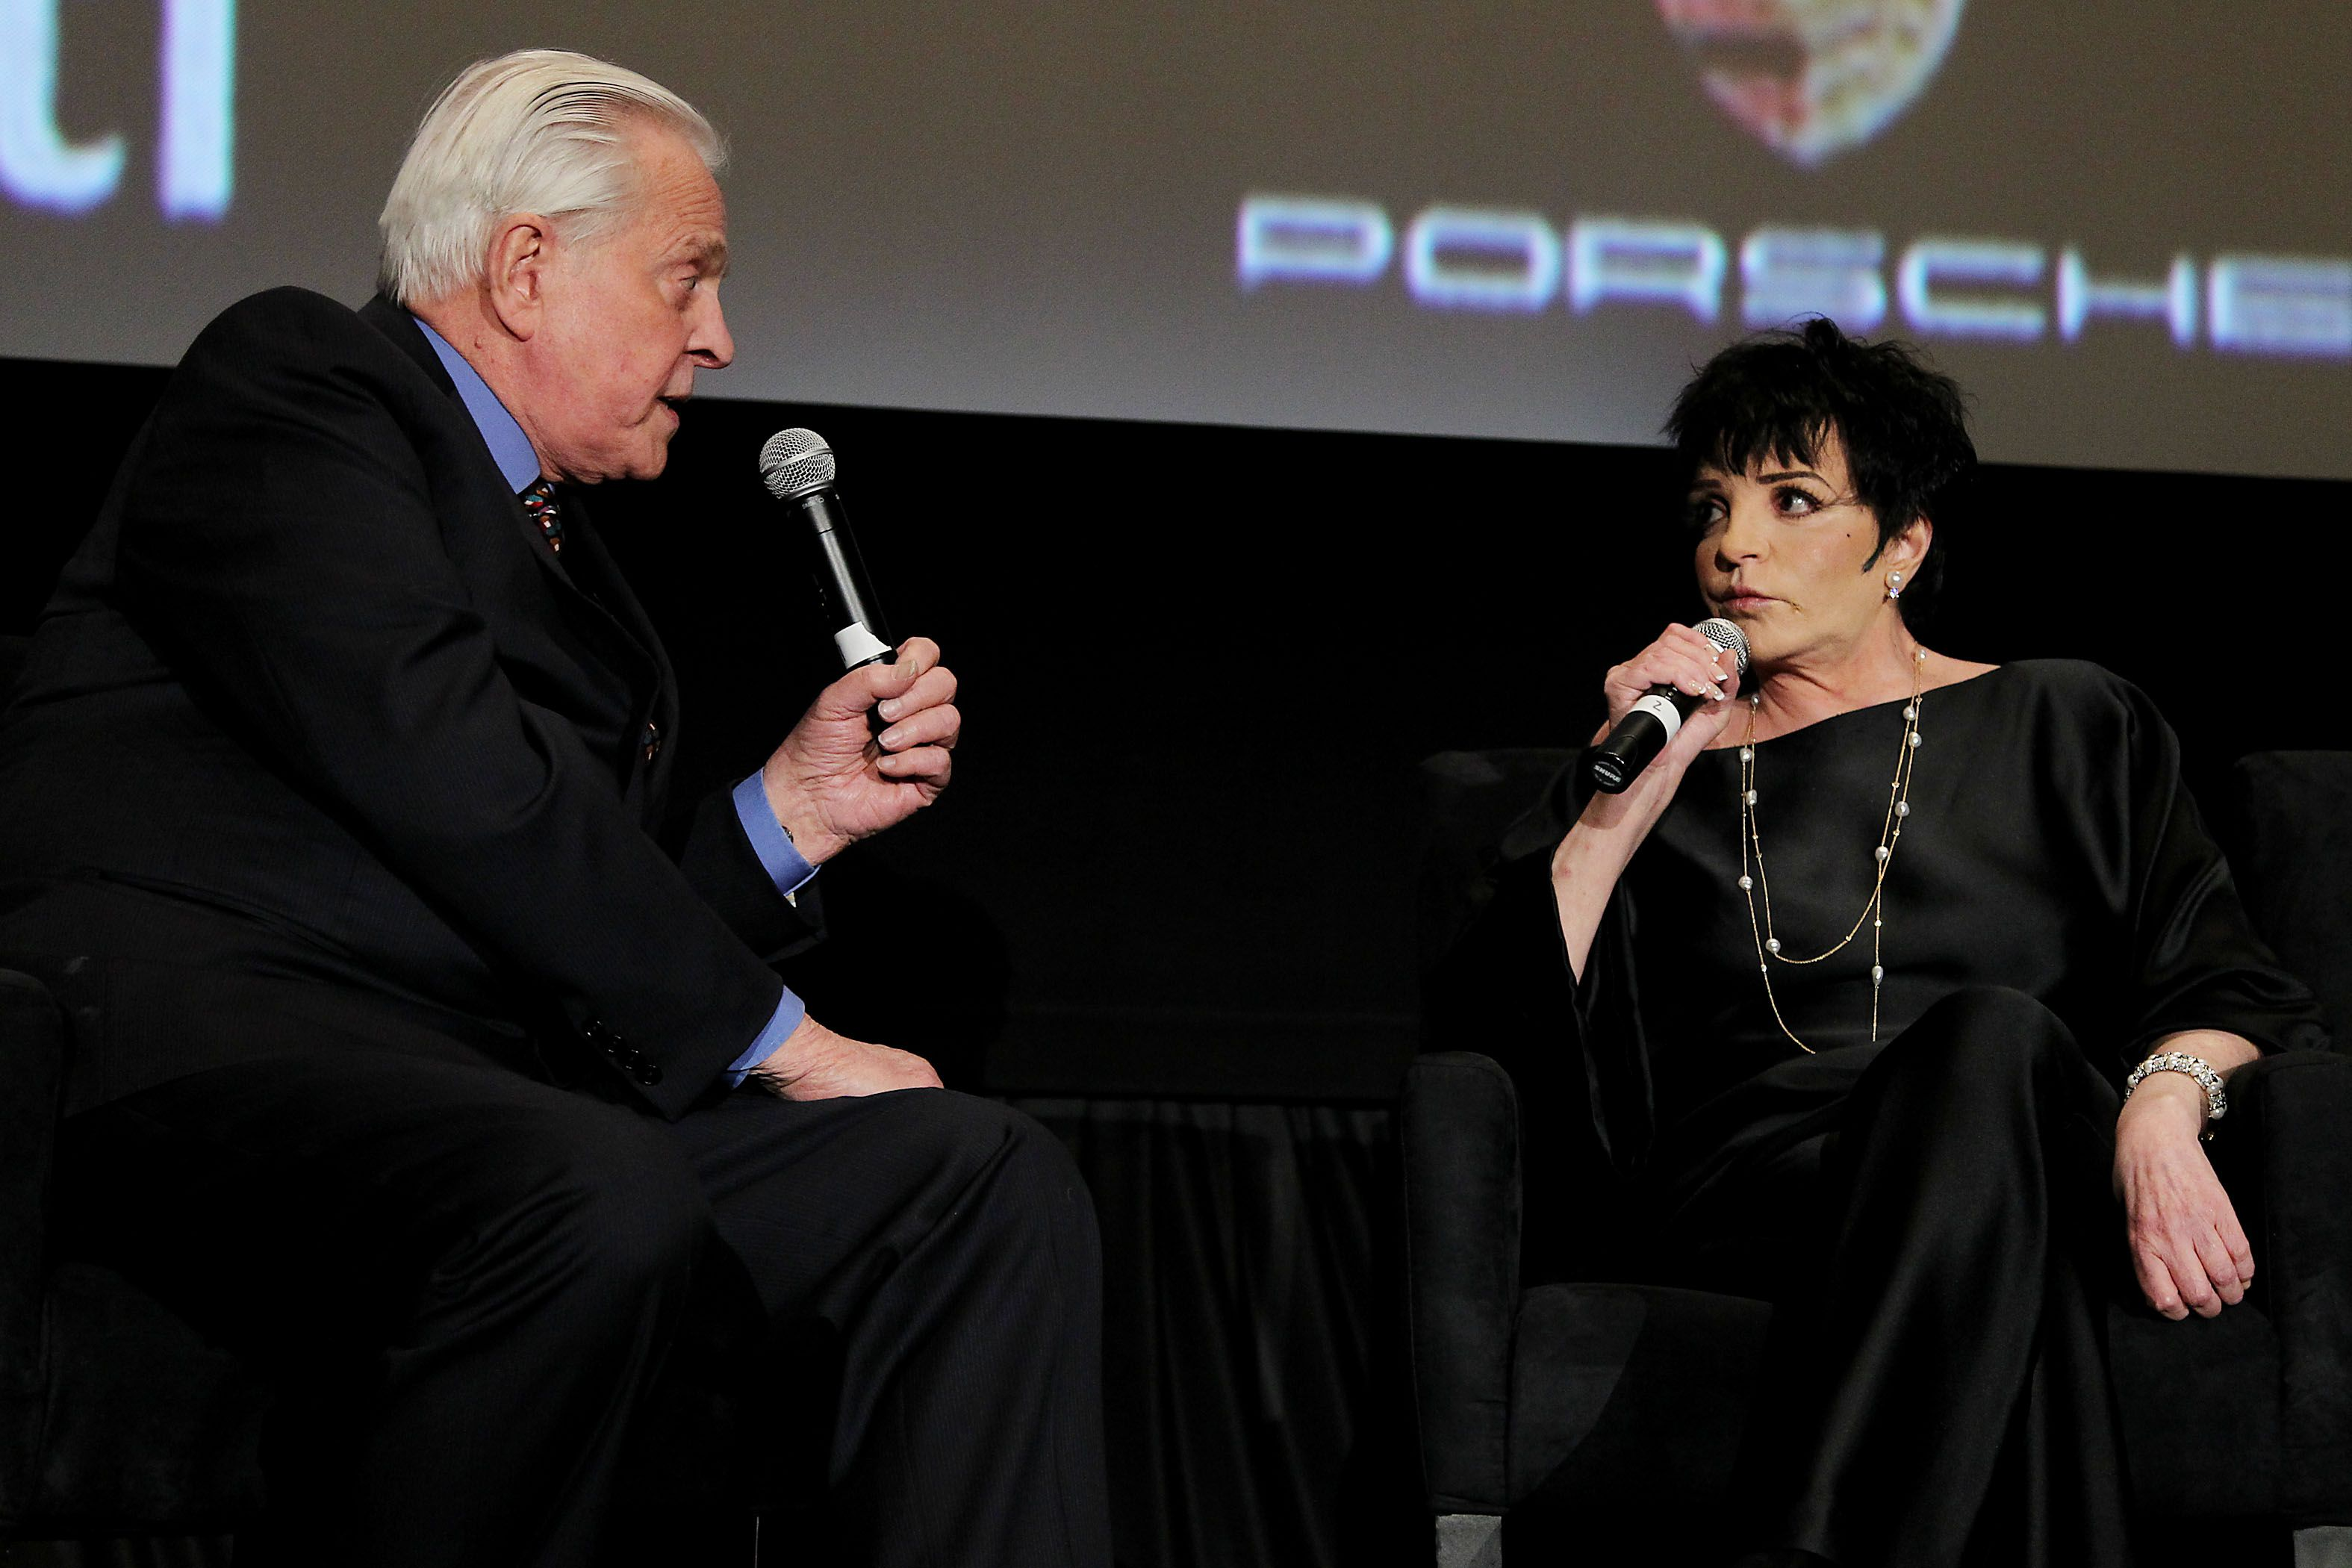 Robert Osborne and Liza Minnelli